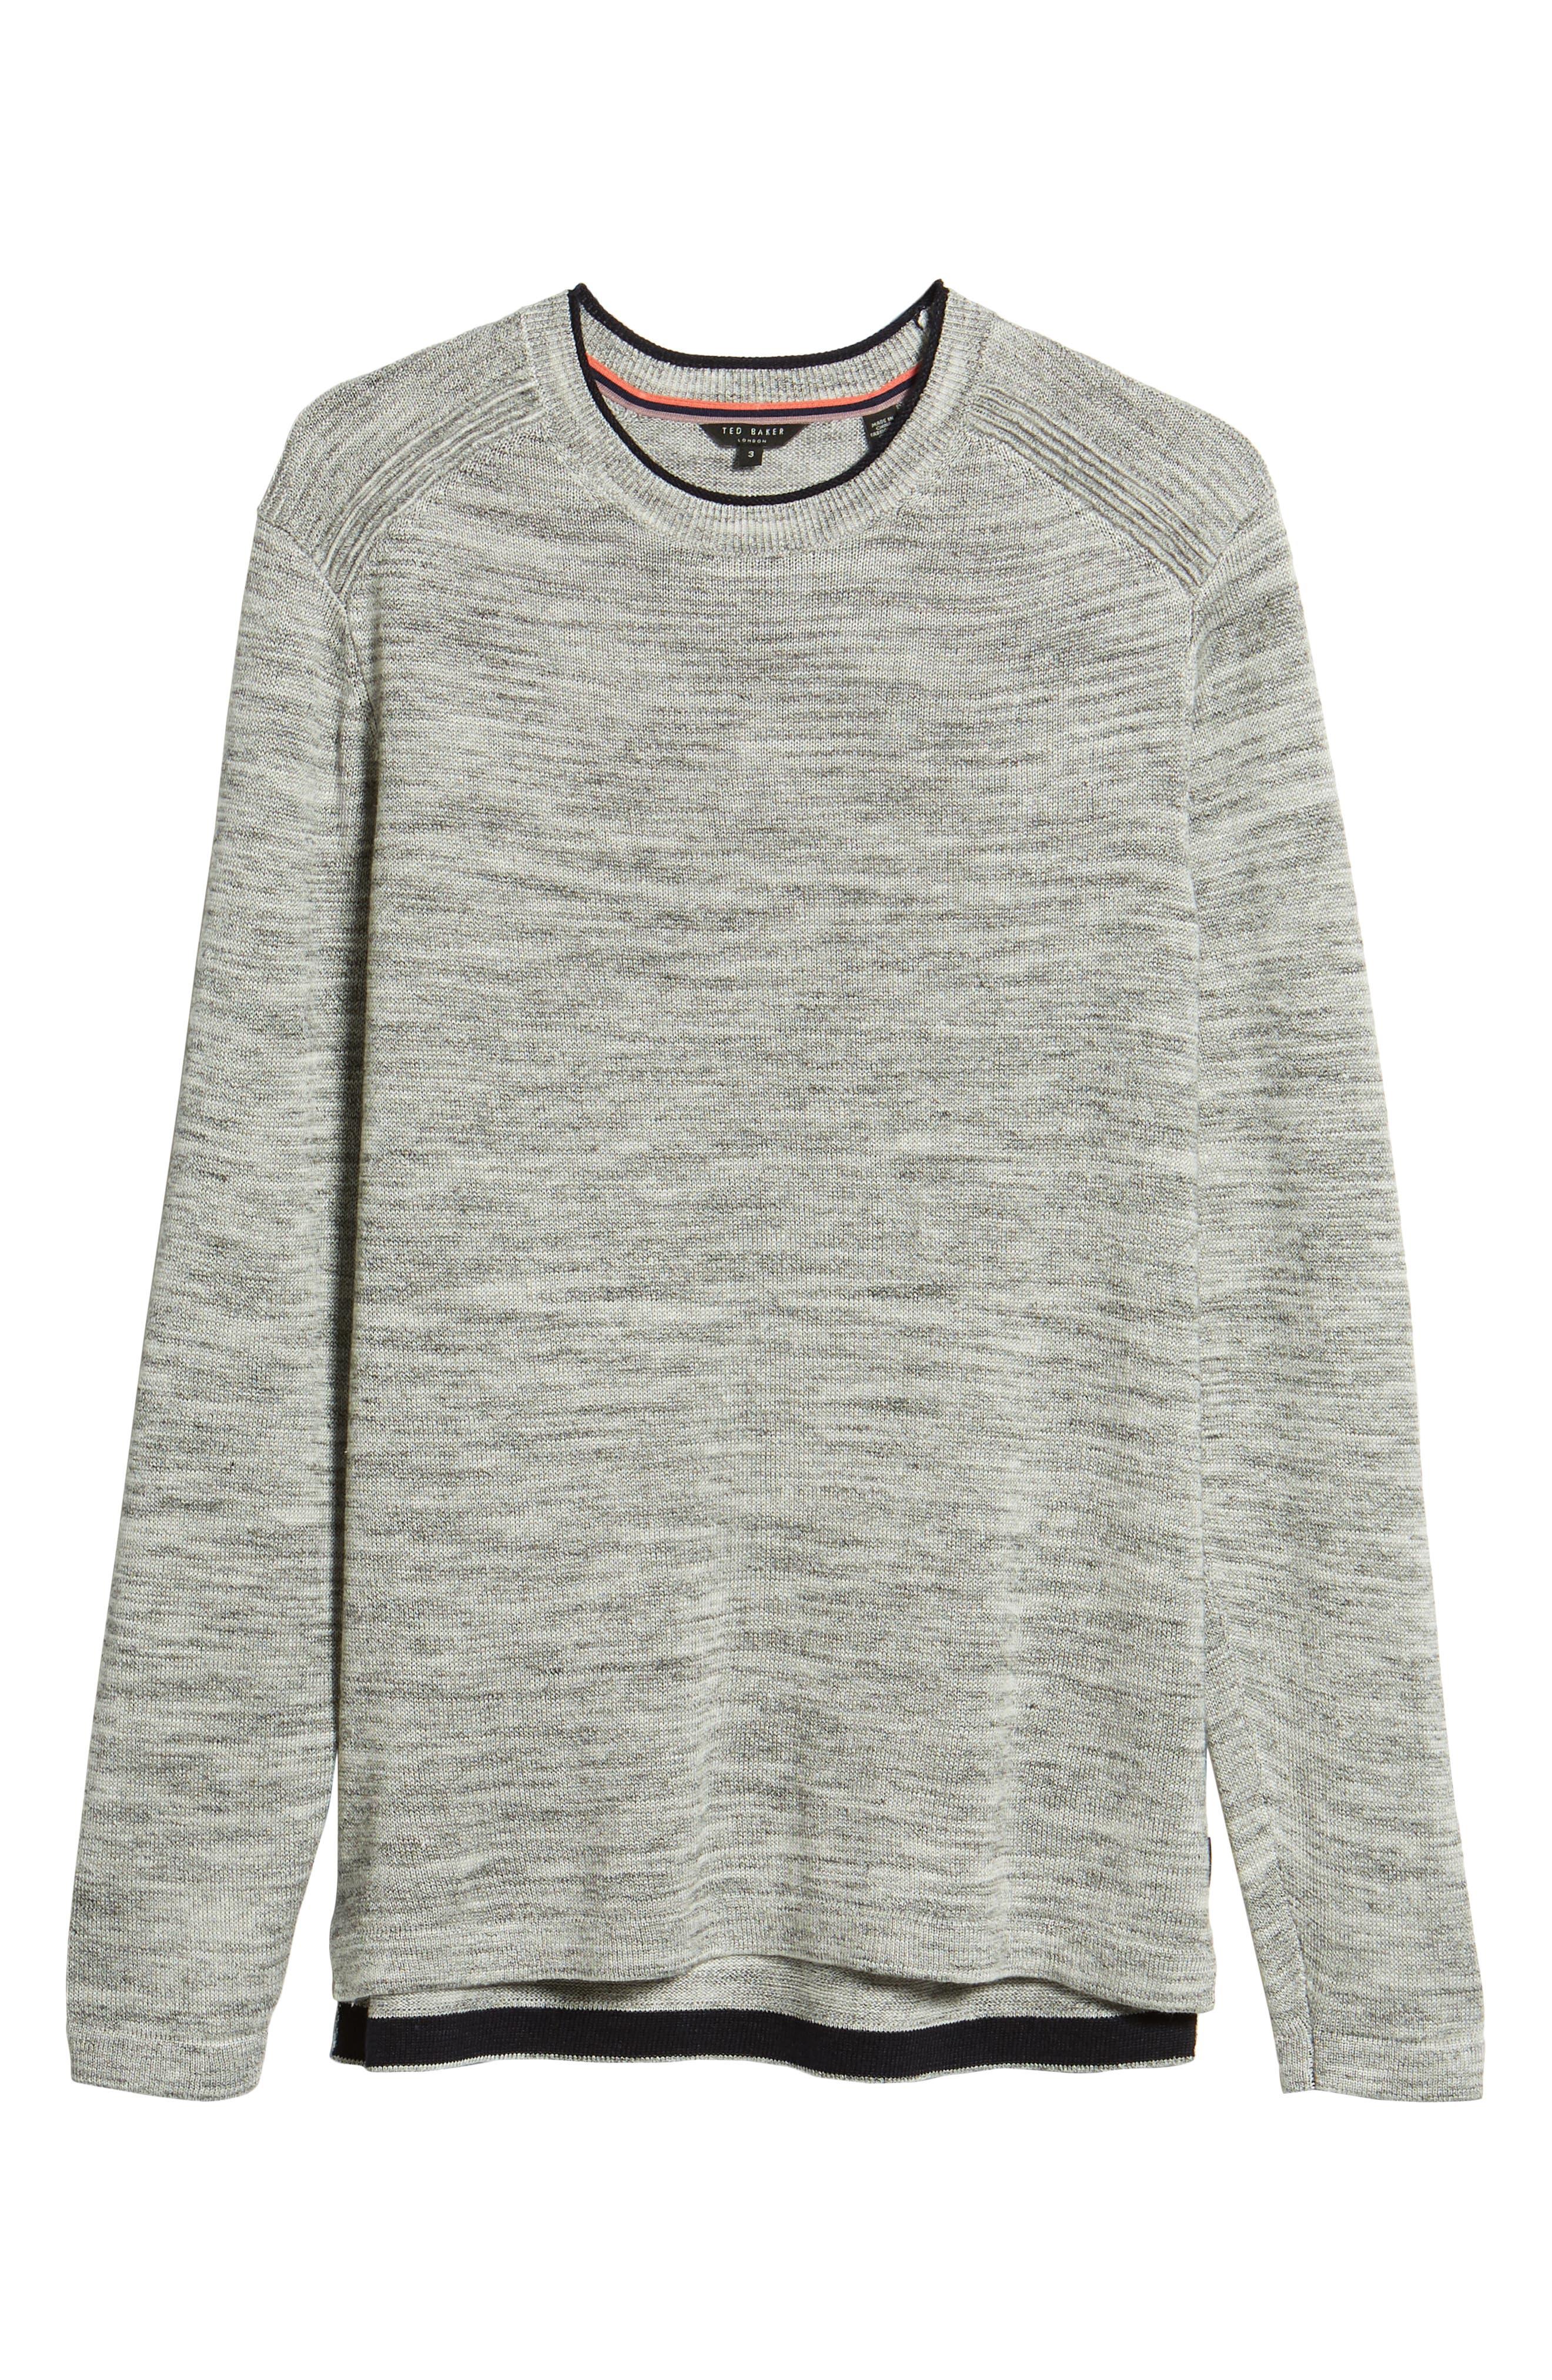 Inzone Crewneck Linen Blend Sweater,                             Alternate thumbnail 6, color,                             LIGHT GREY